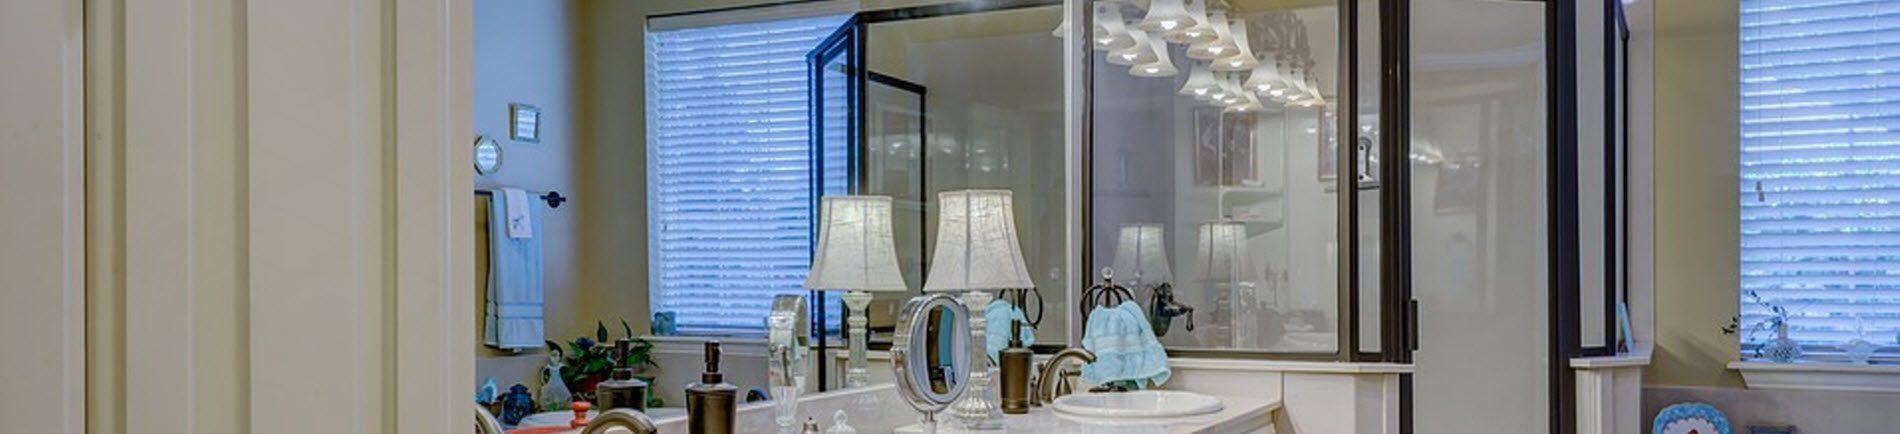 Window Installation & Replacement - M & M Glass – Whittier, CA ...